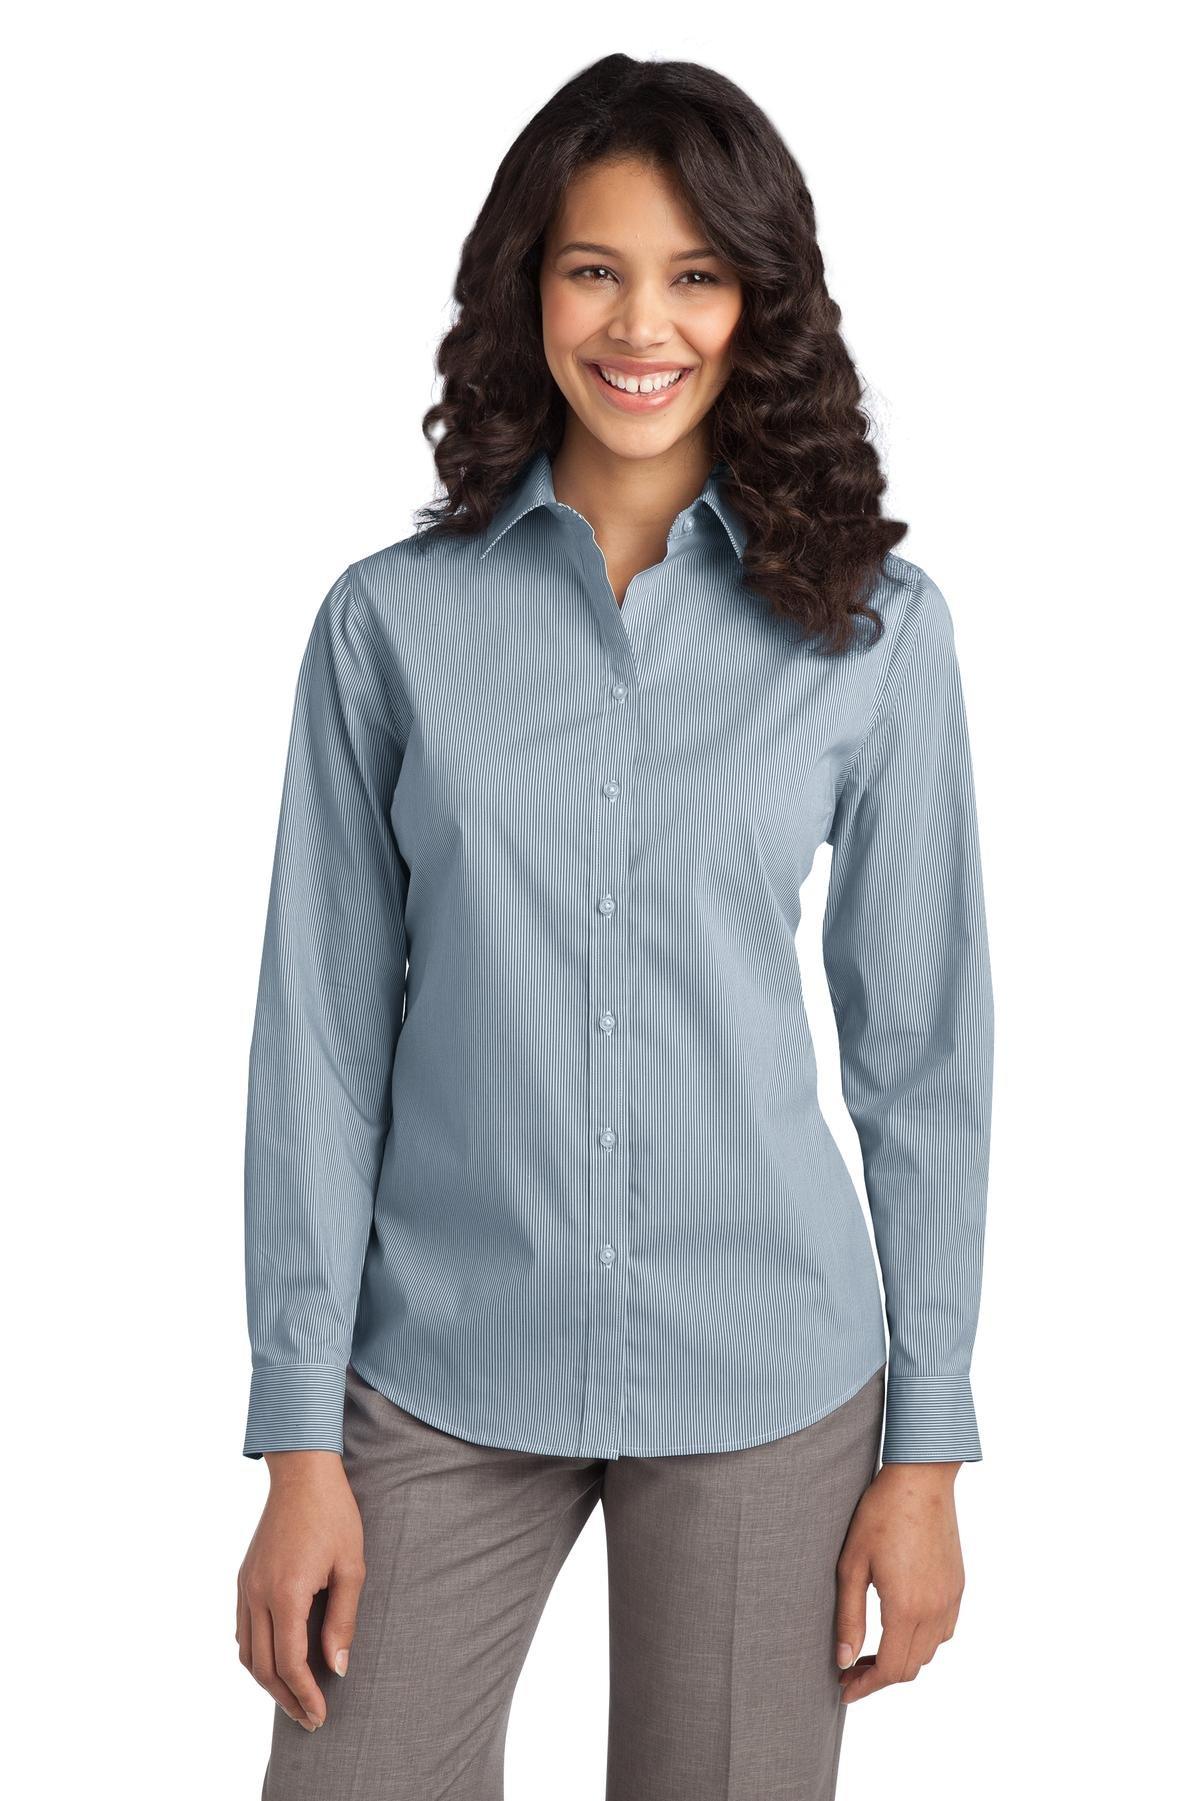 Port Authority Women's Fine Stripe Stretch Poplin Shirt M Moonlight Blue/ White